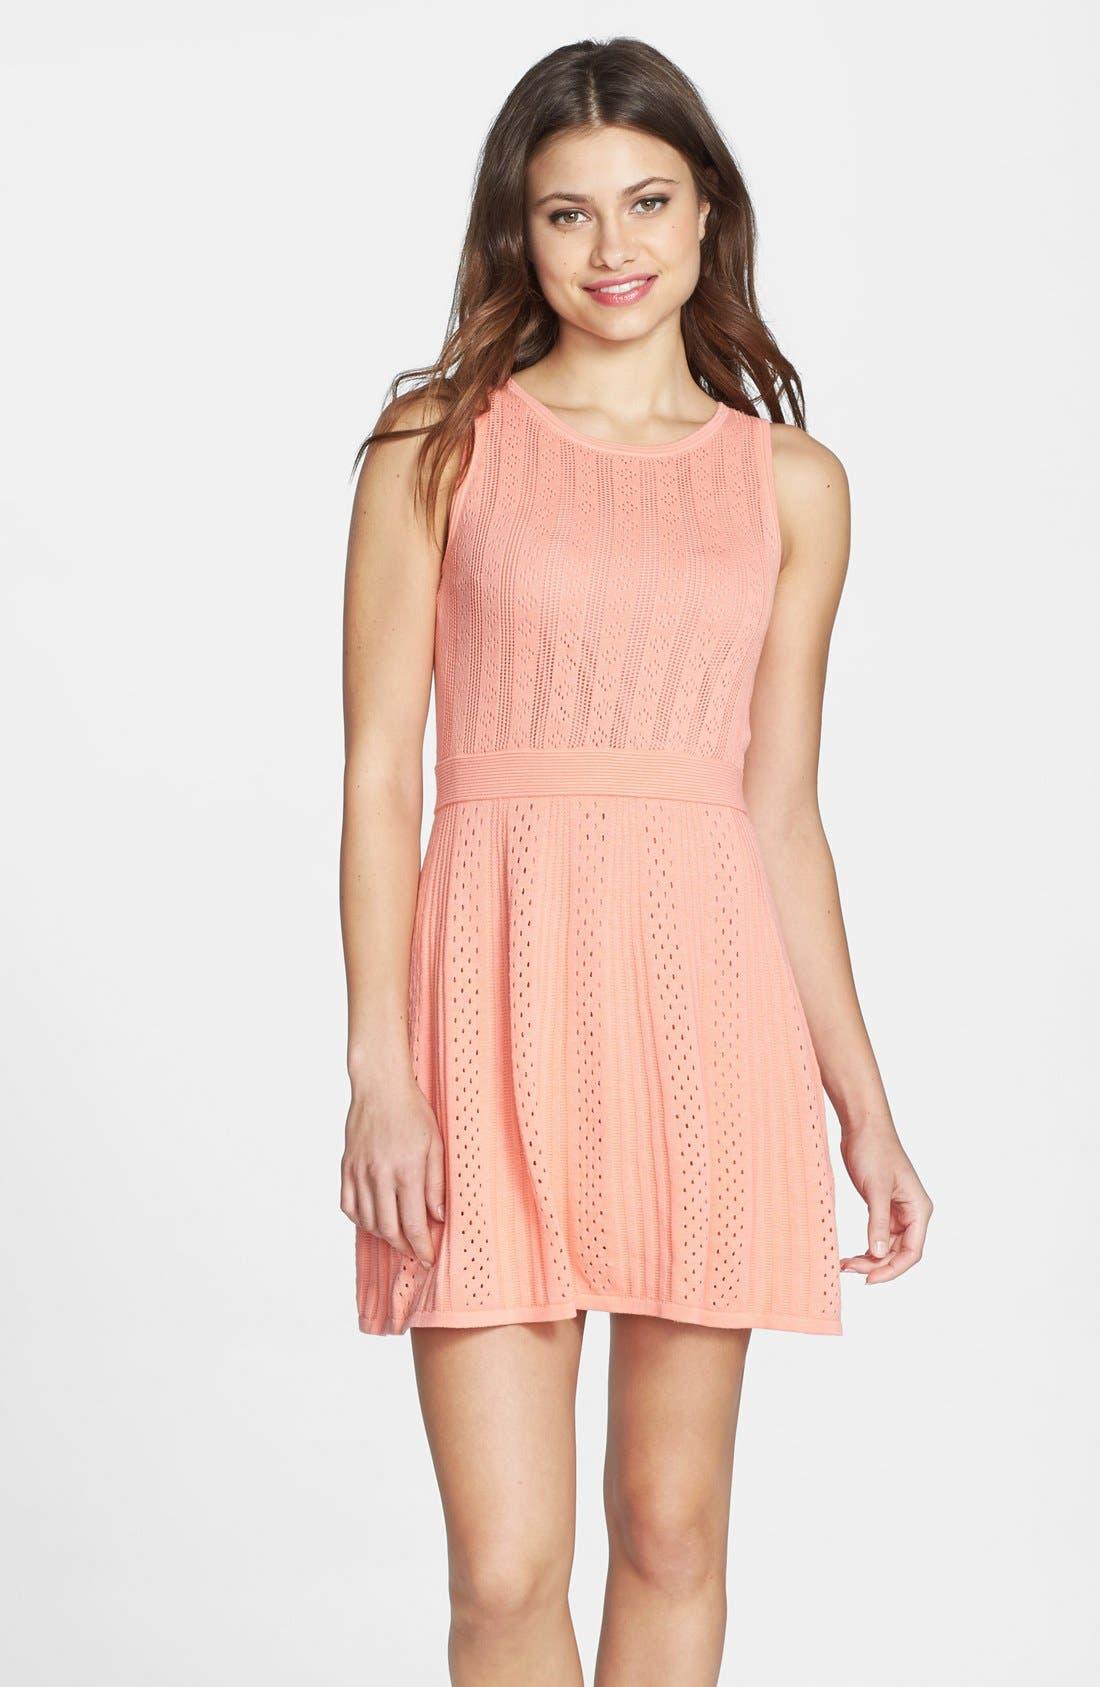 Alternate Image 1 Selected - Trina Trina Turk 'Marcela' Cotton Pointelle Knit Dress